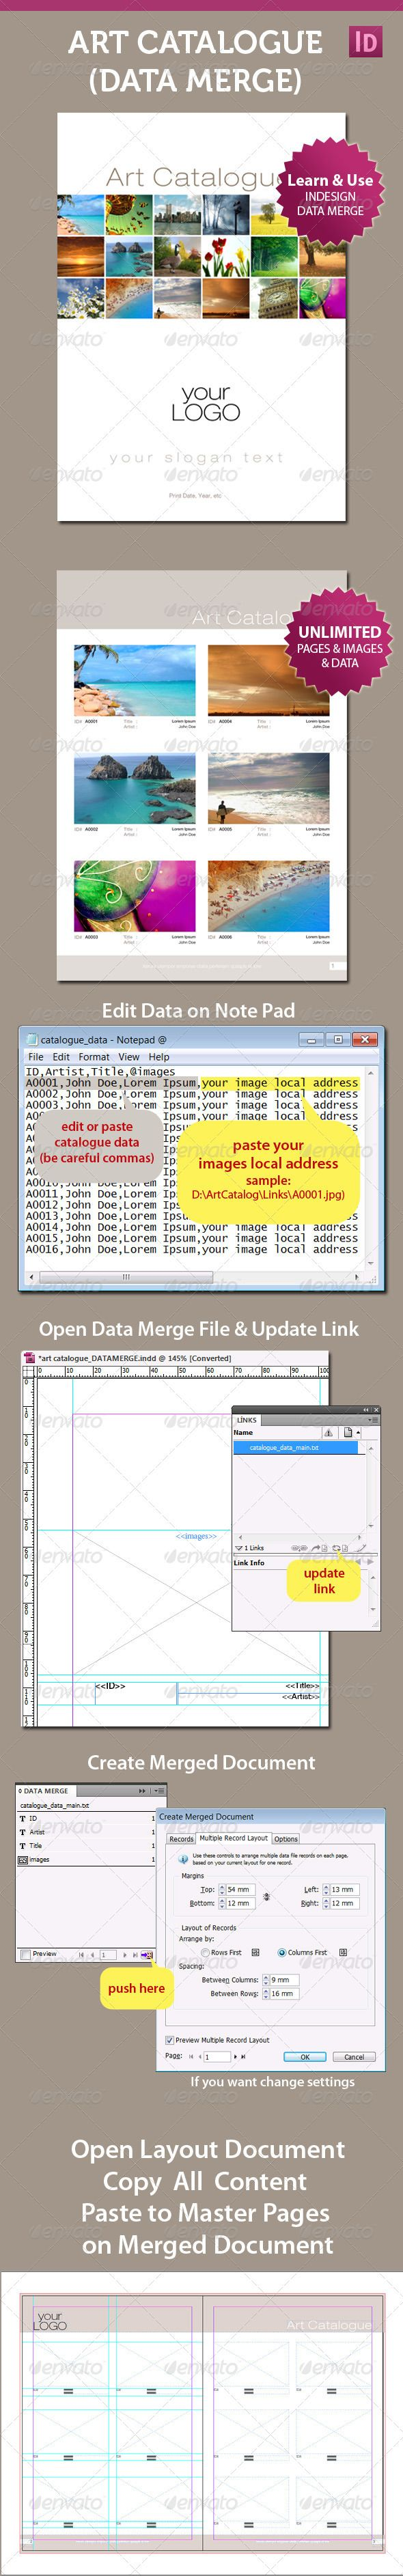 Art Catalogue Template For InDesign Data Merge | Catálogo